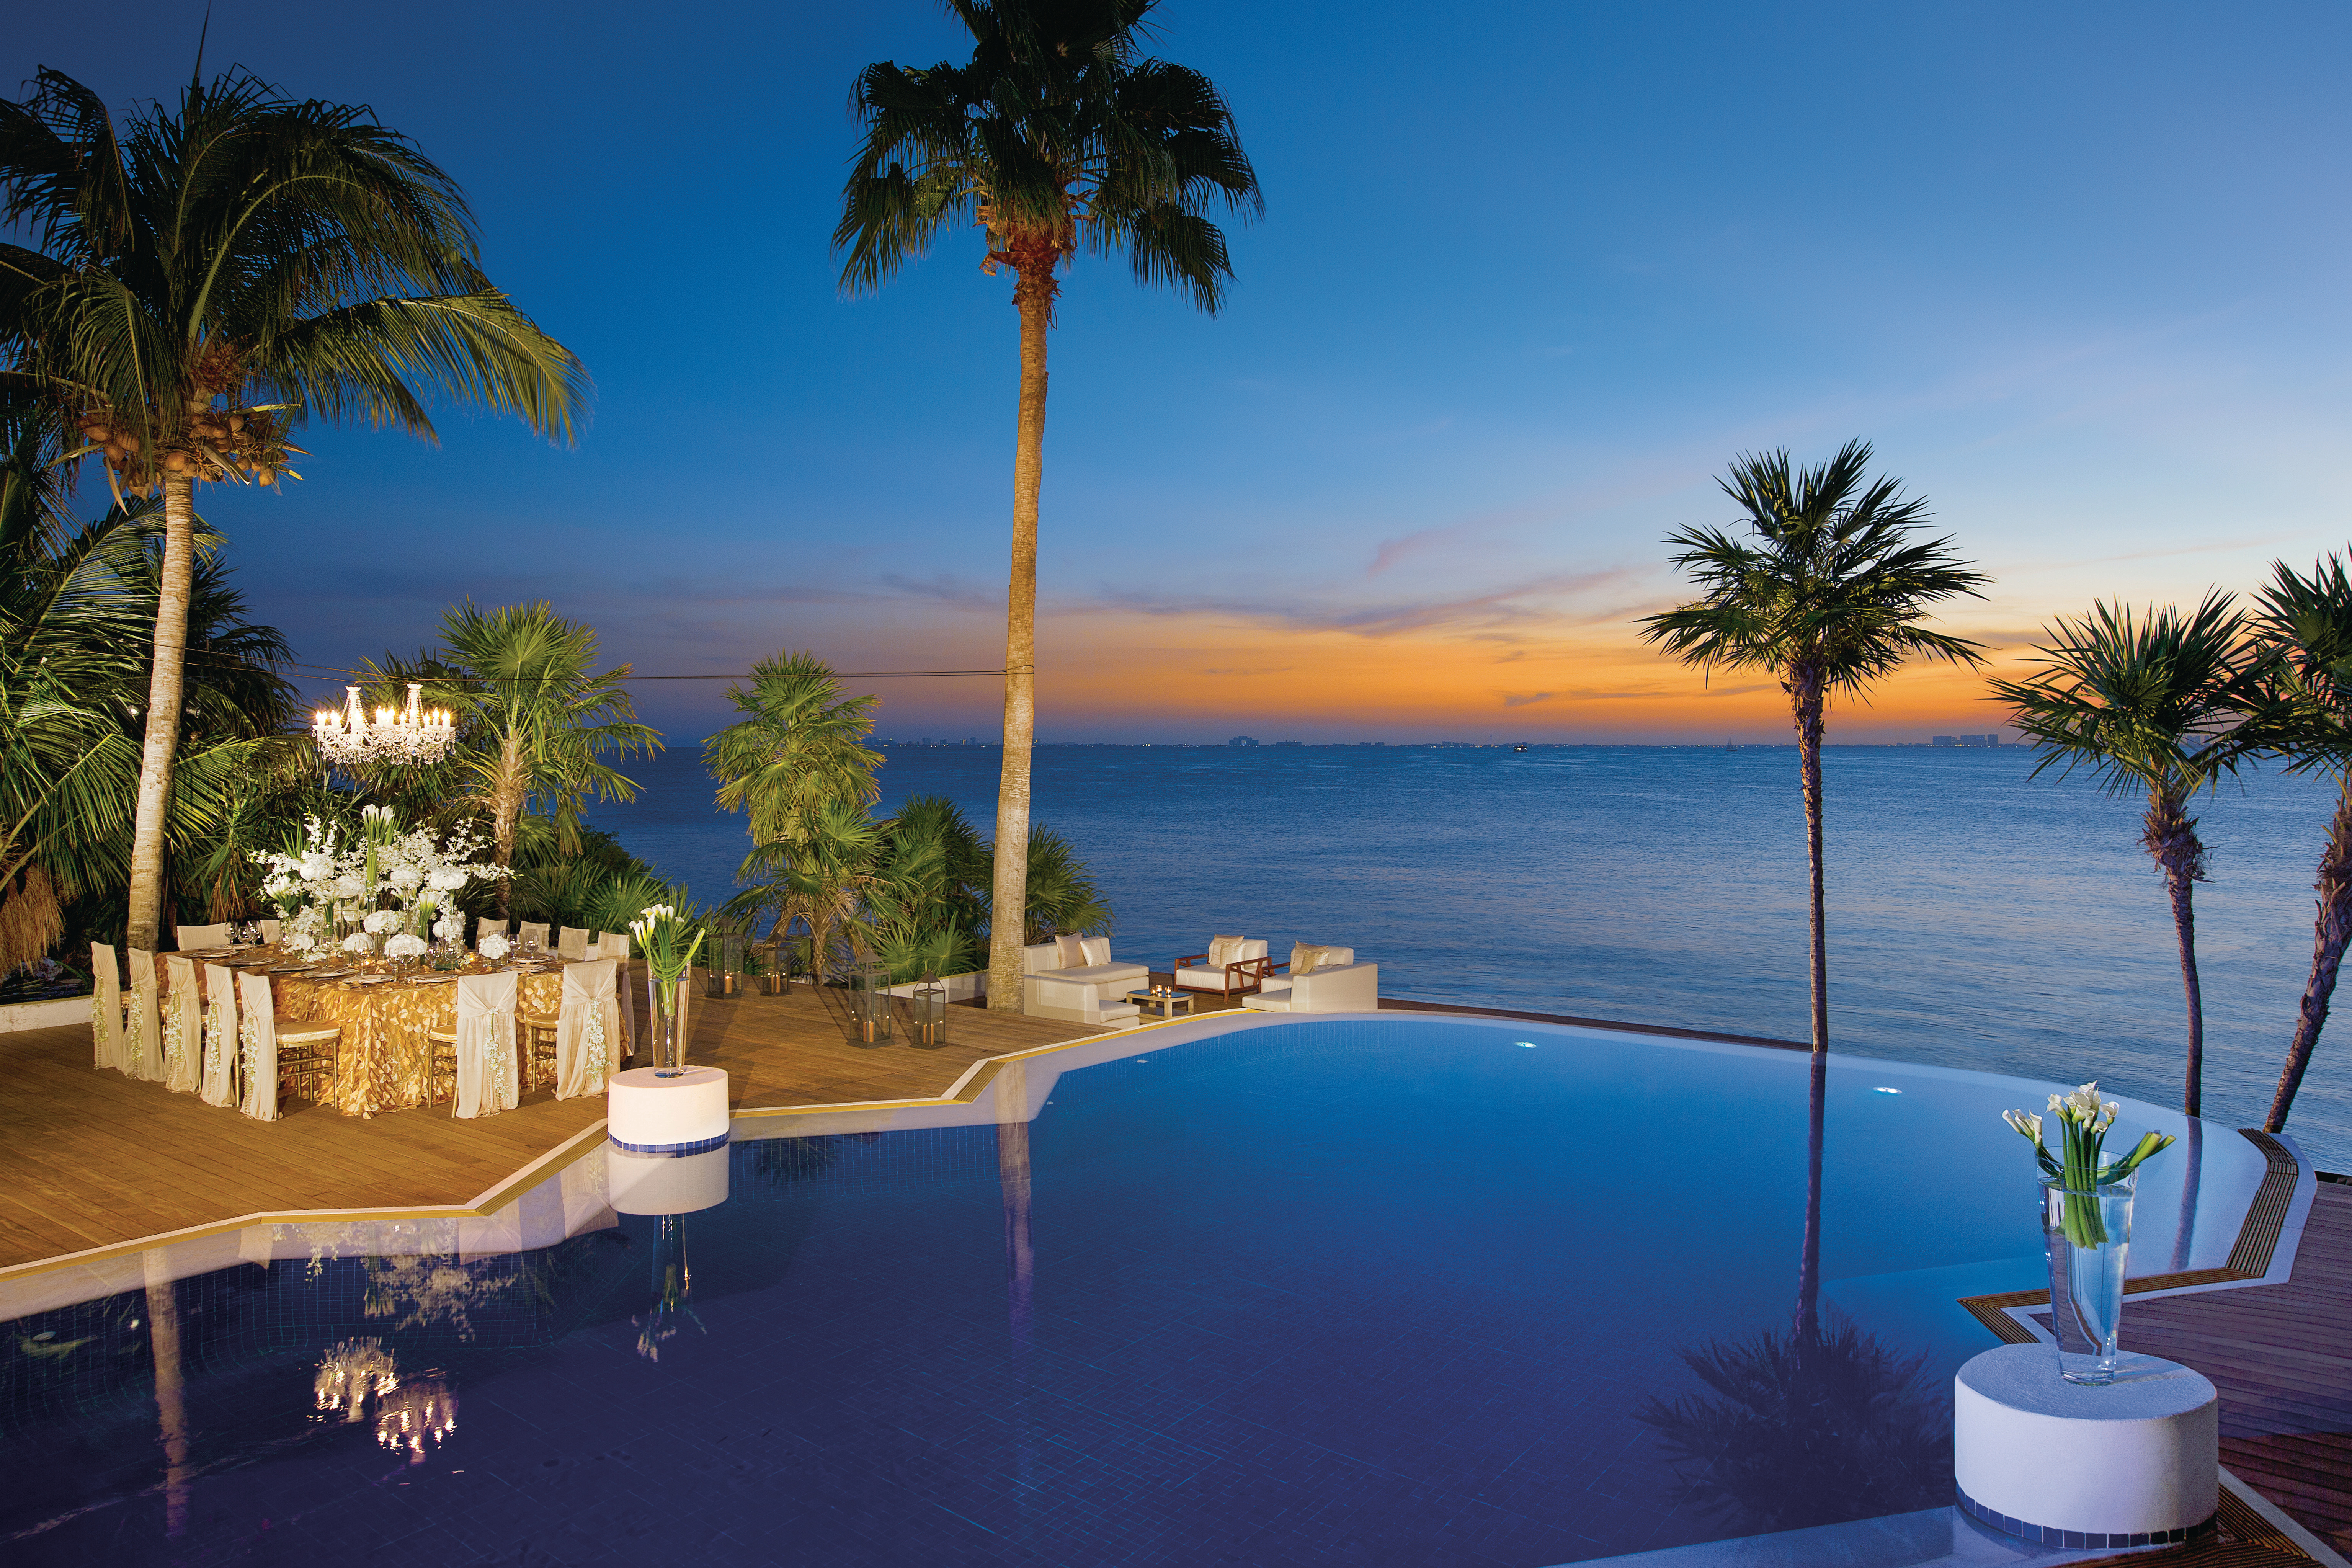 Travel Agency All-Inclusive Resort Zoetry Villa Rolandi Isla Mujeres Cancun 18